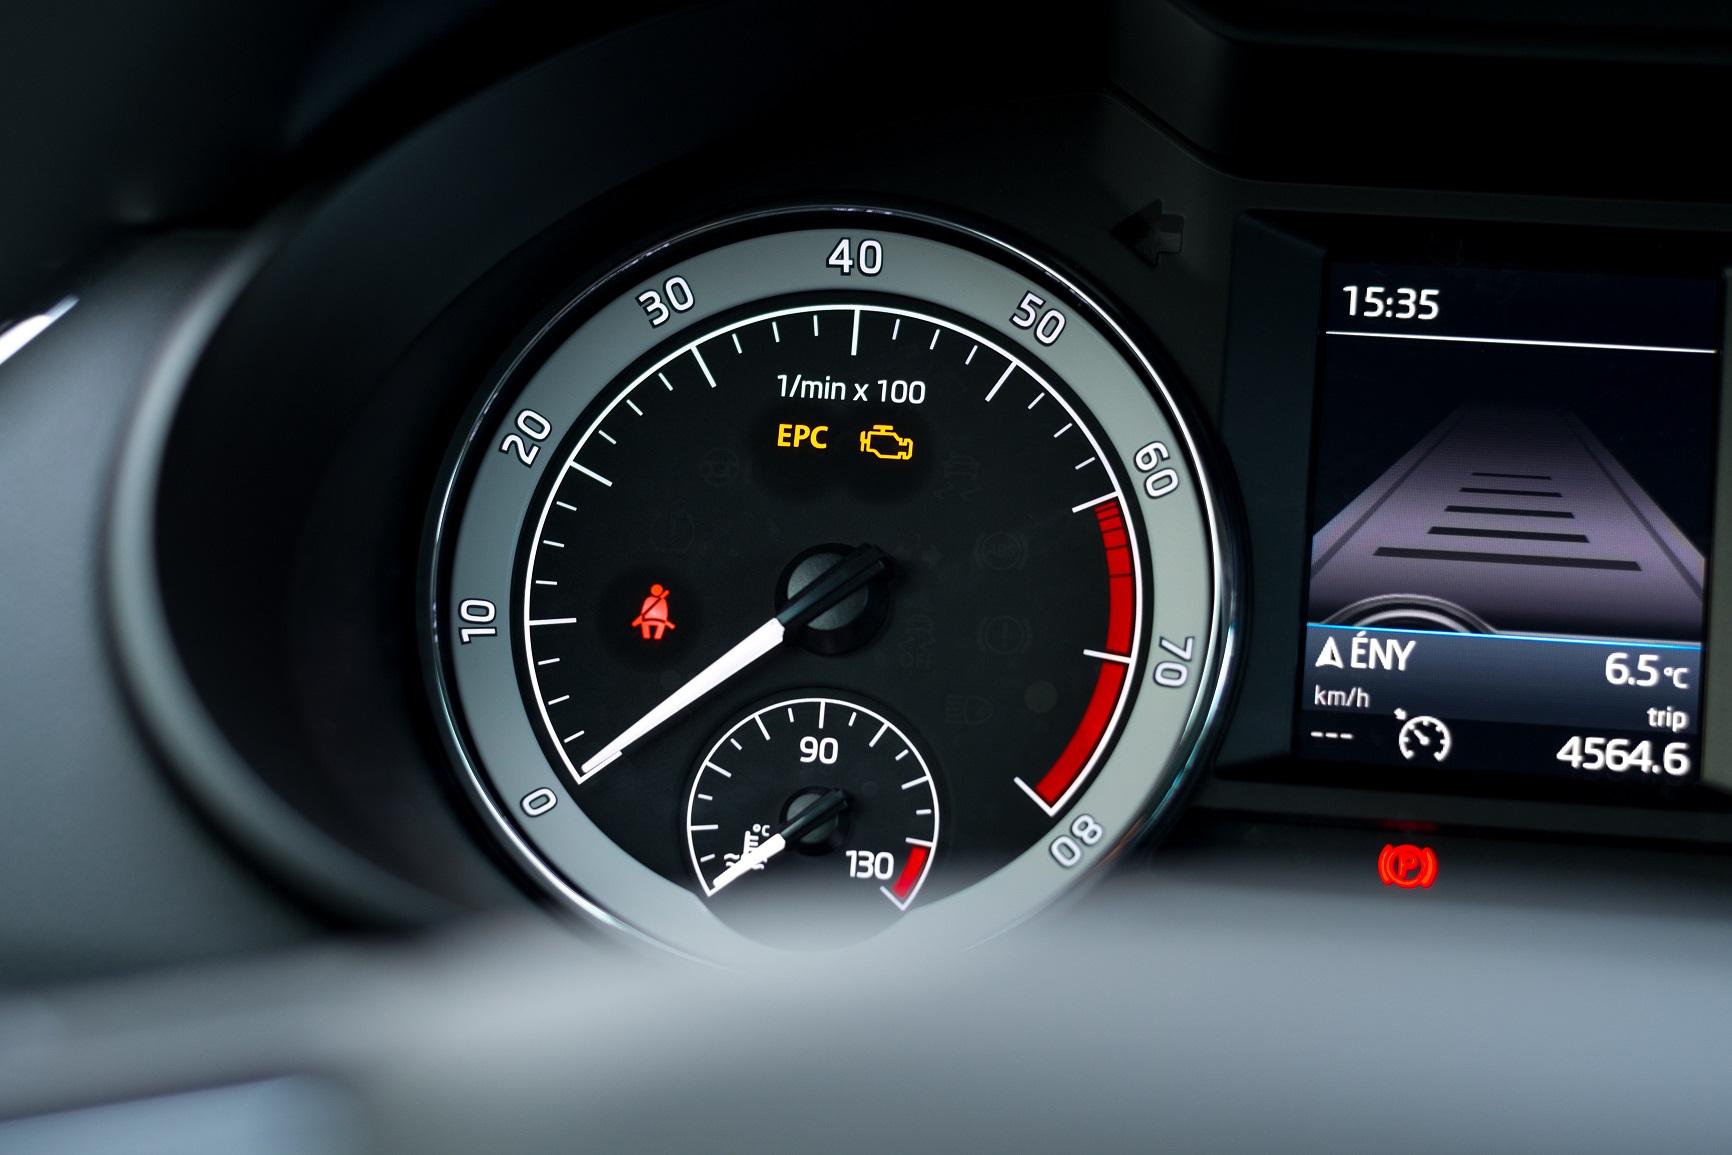 luz do epc acesa no panel do carro